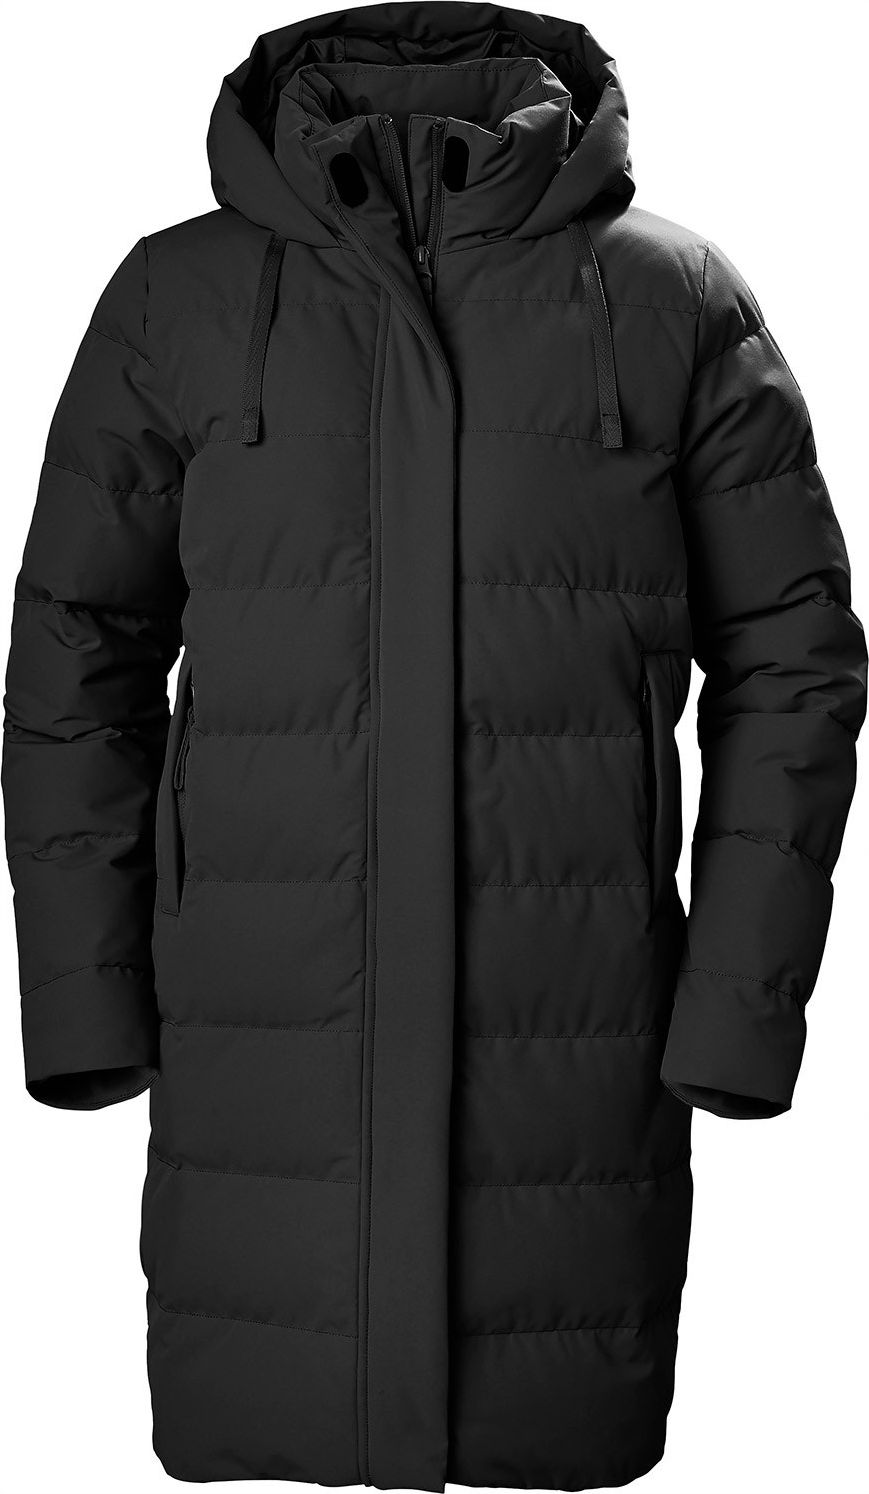 HELLY HANSEN Mono Material Puffy Jacket Women's Black M